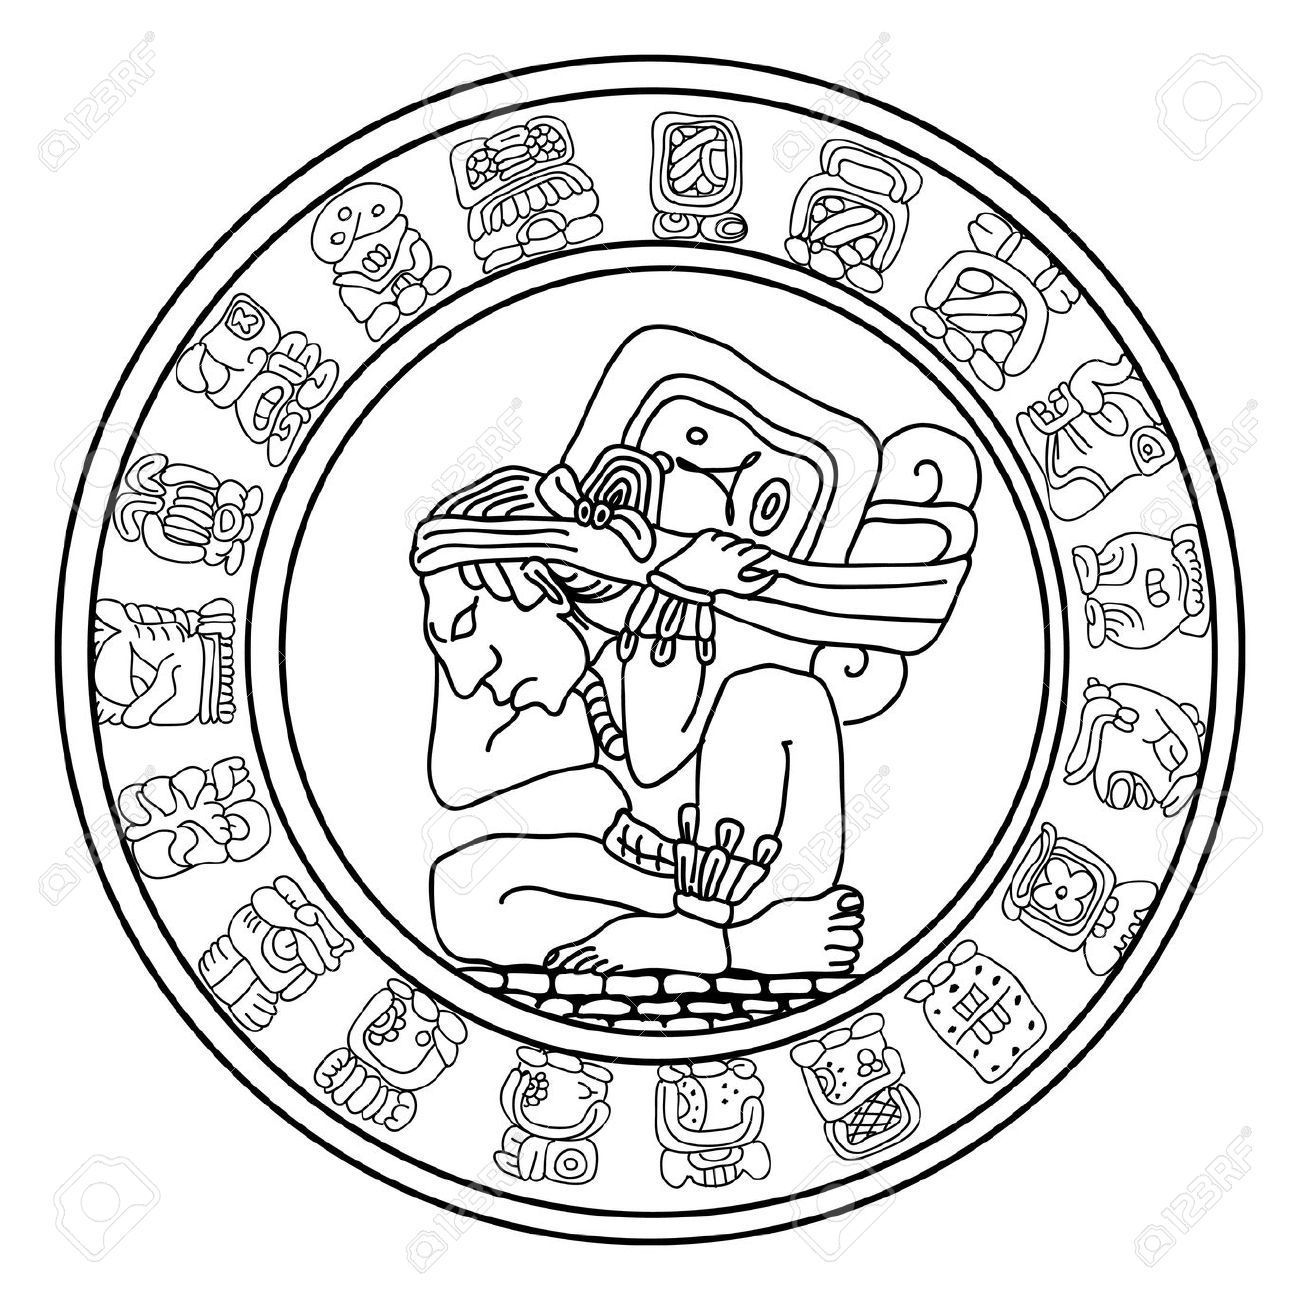 Image Result For Imagenes Para Serigrafia Gratis Mayan Symbols Mayan Art Aztec Art